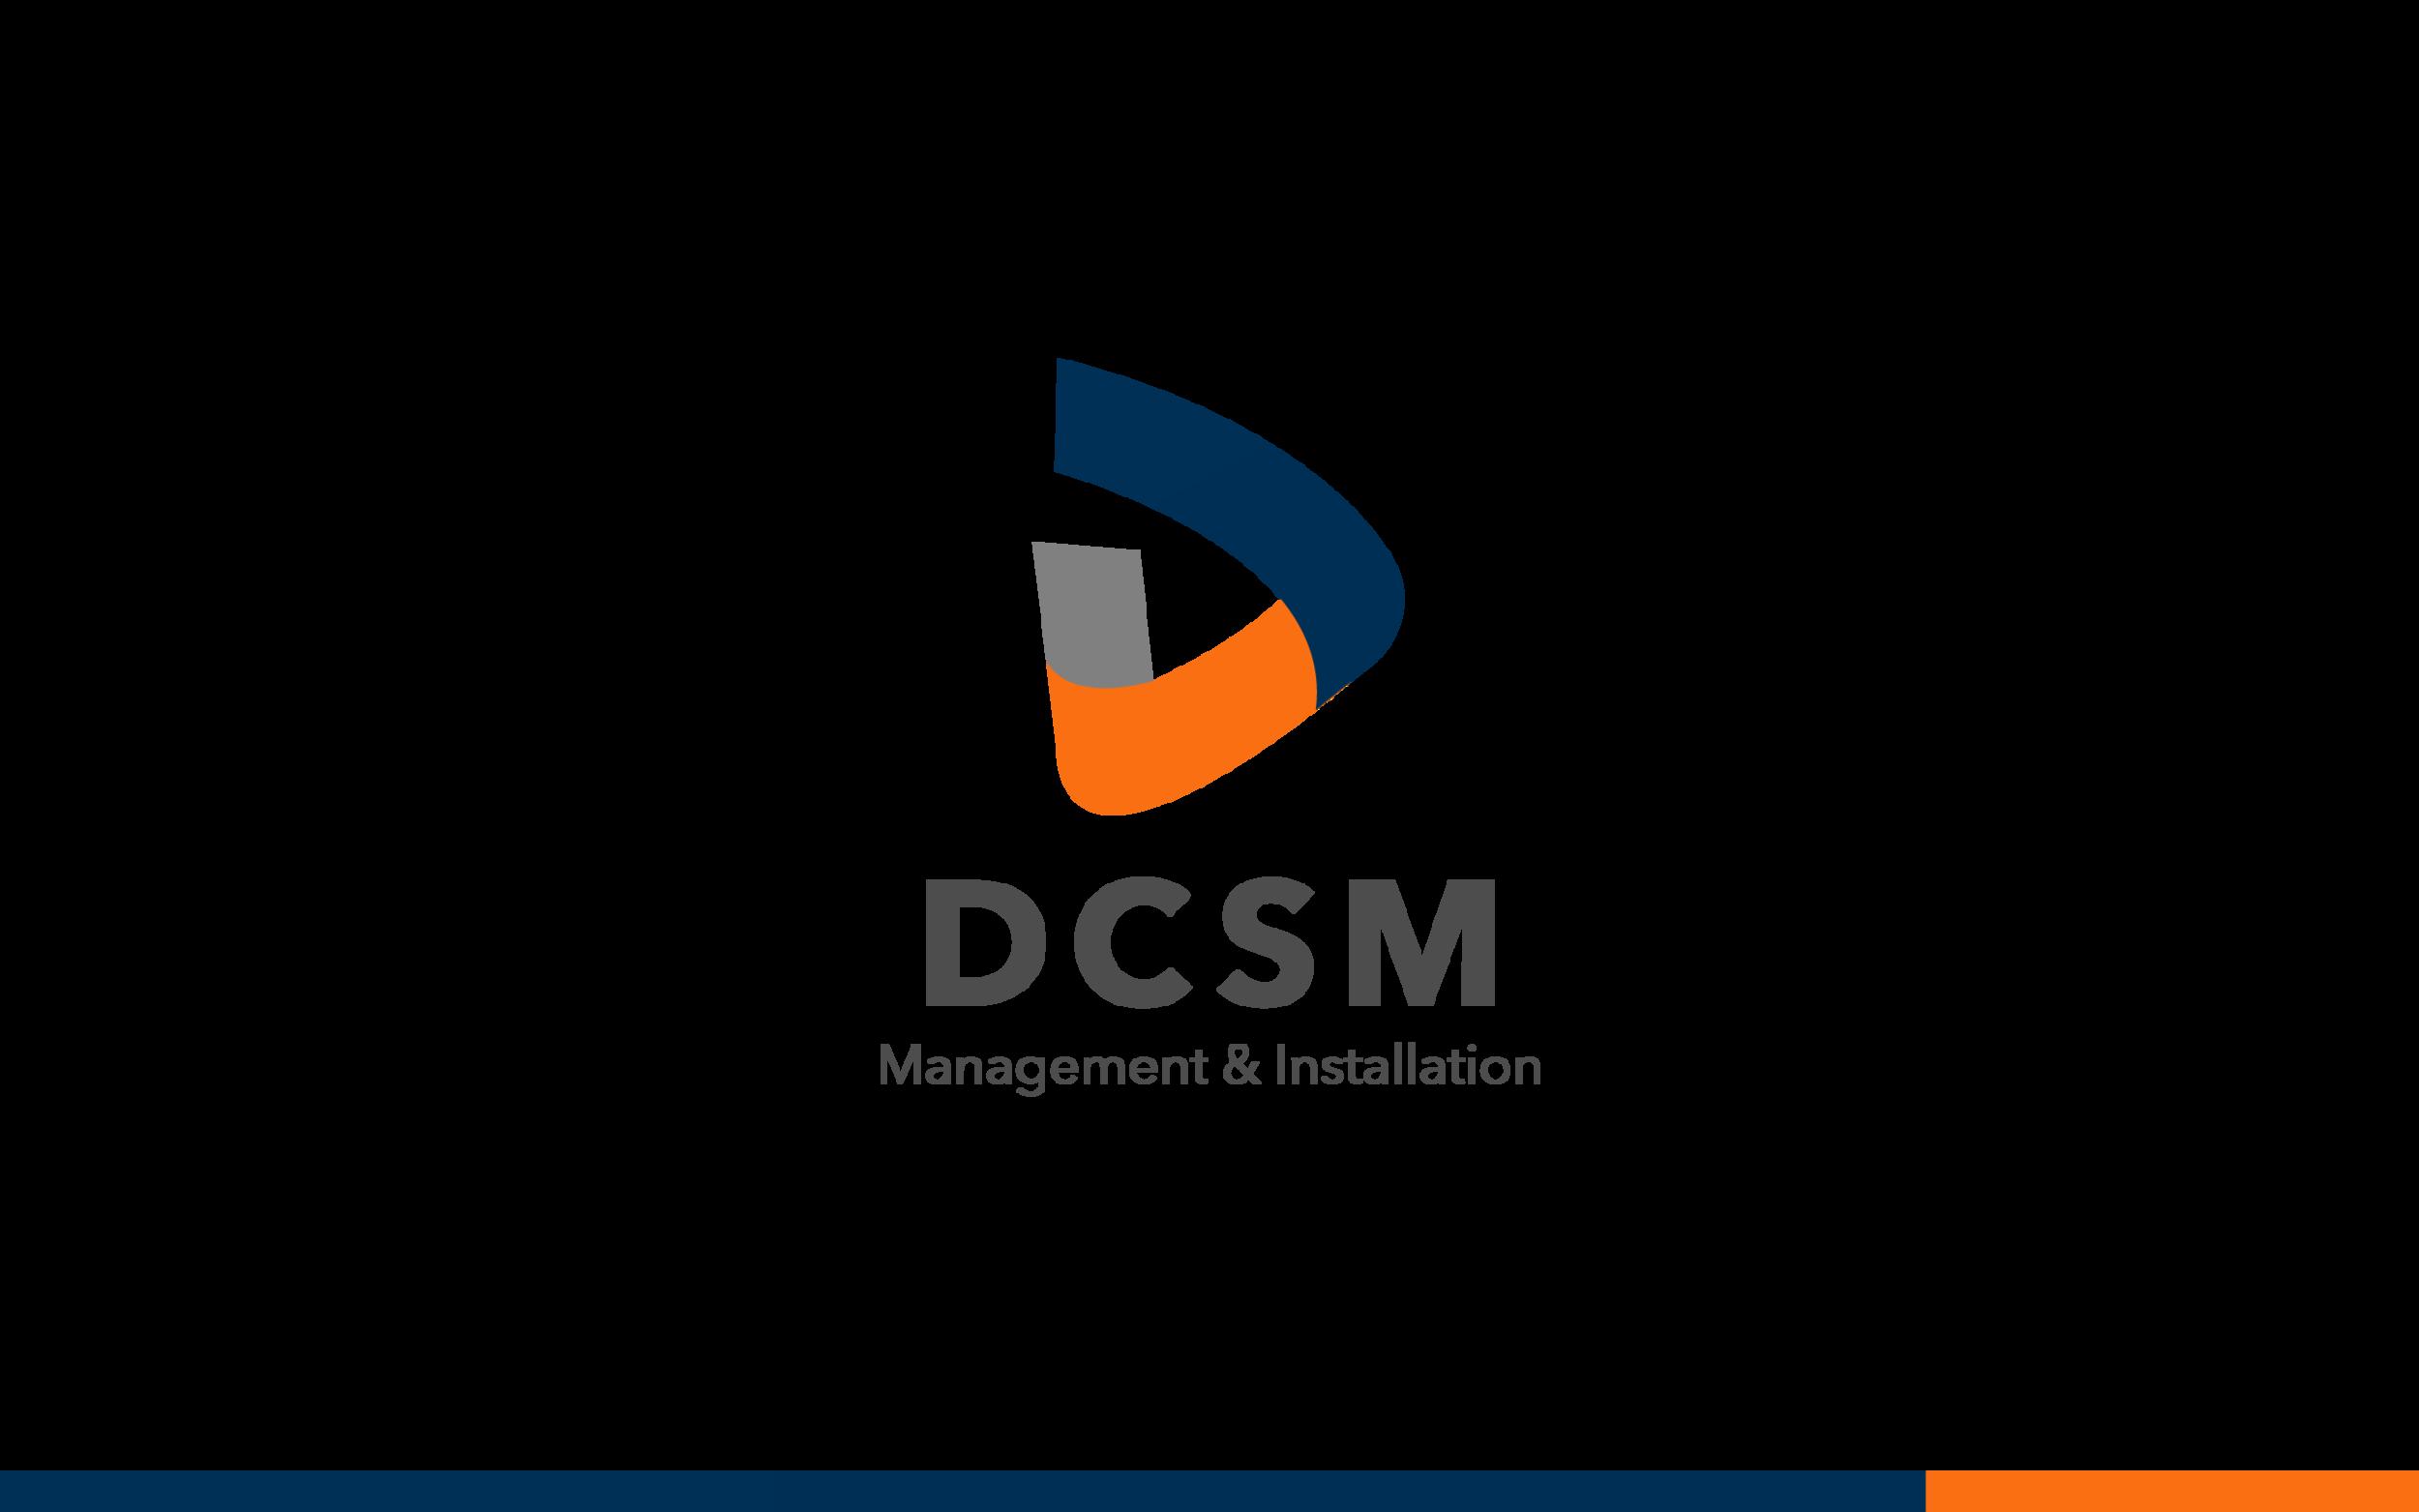 DCSM Logo-01.png